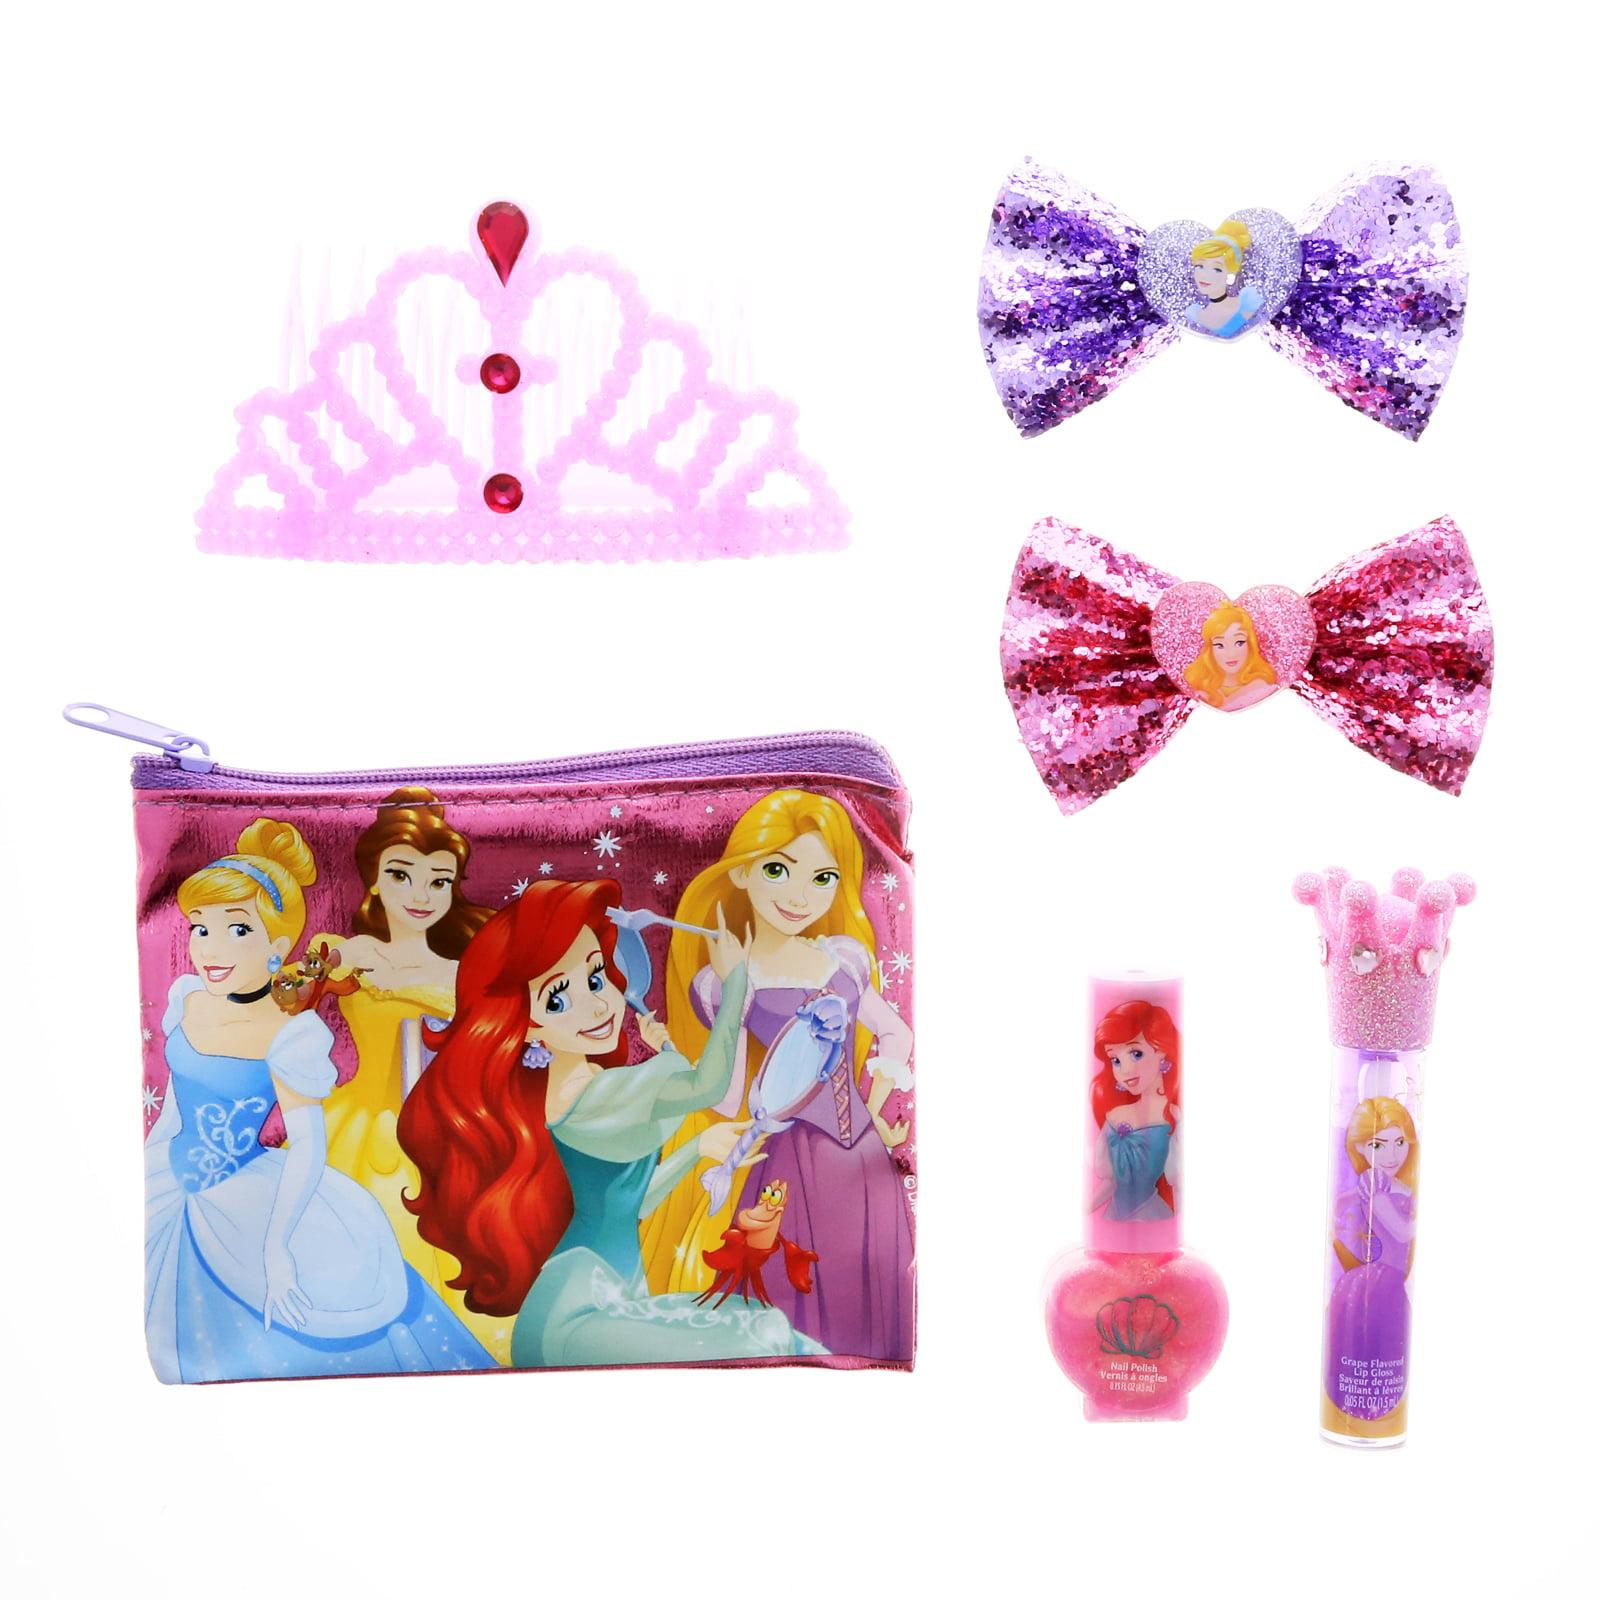 Disney Princess Girls Hair Clips Accessories Beauty Gift Set Cosmetics Makeup